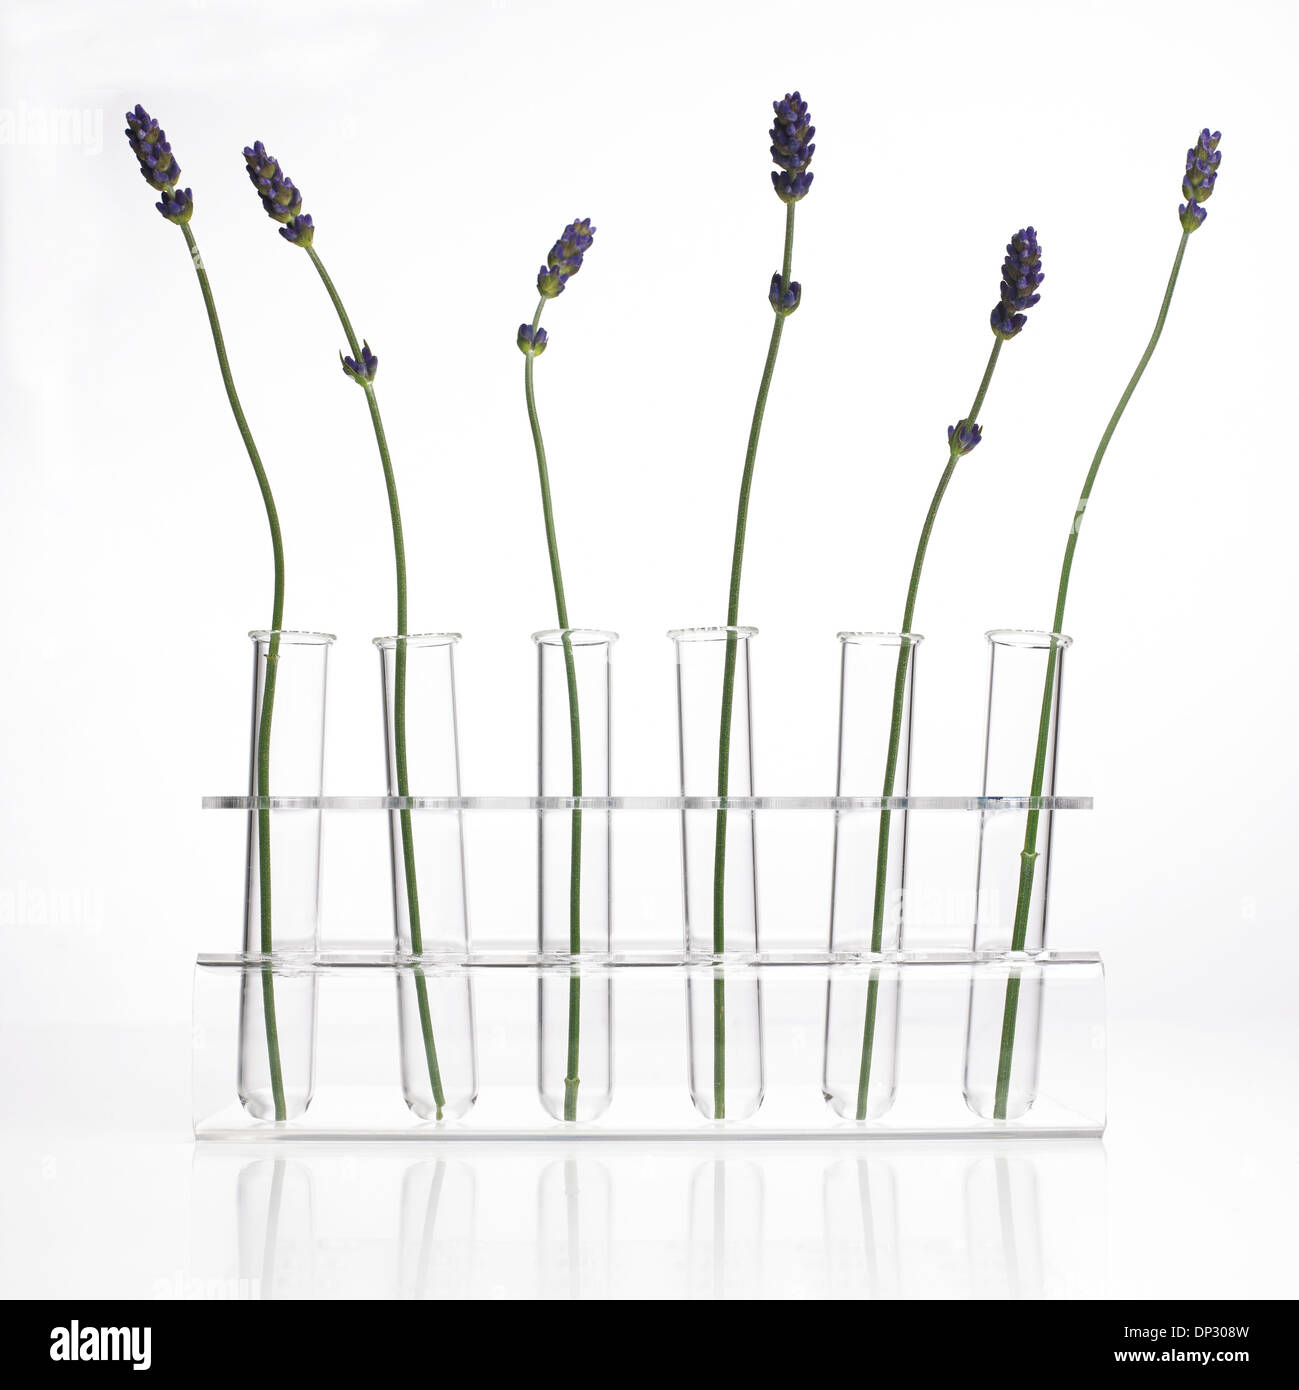 Lavender Lavandula sp stems - Stock Image